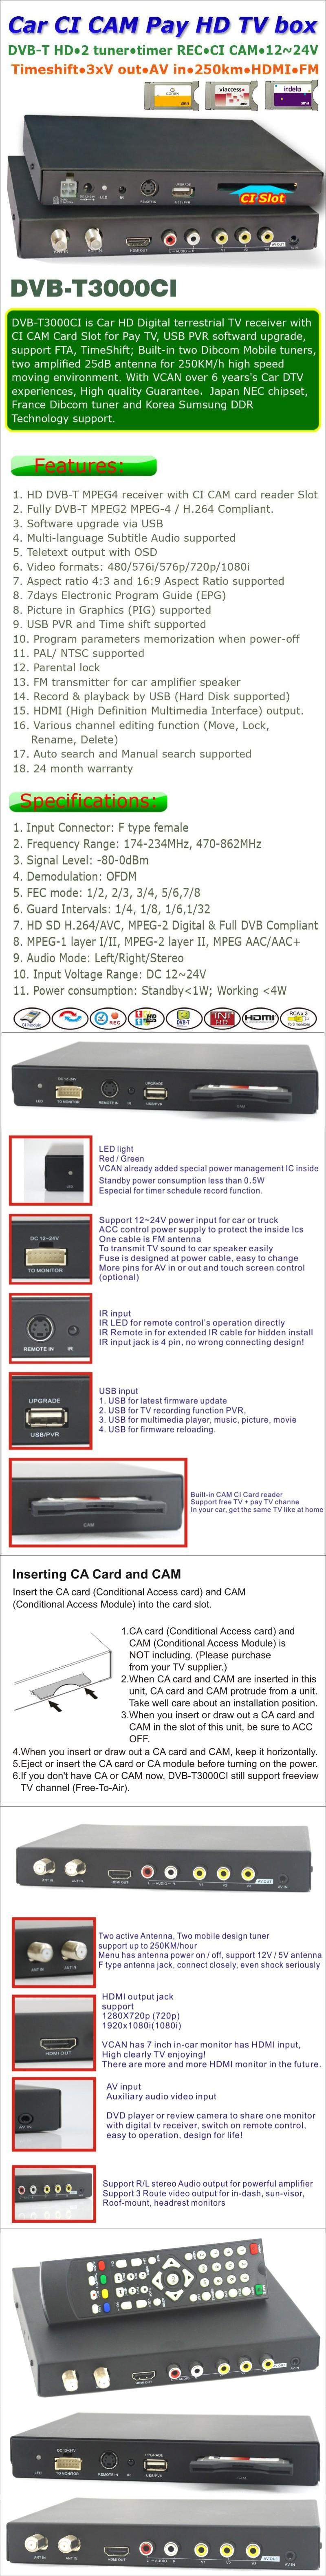 mpeg4 h264 hd dvb-t receiver